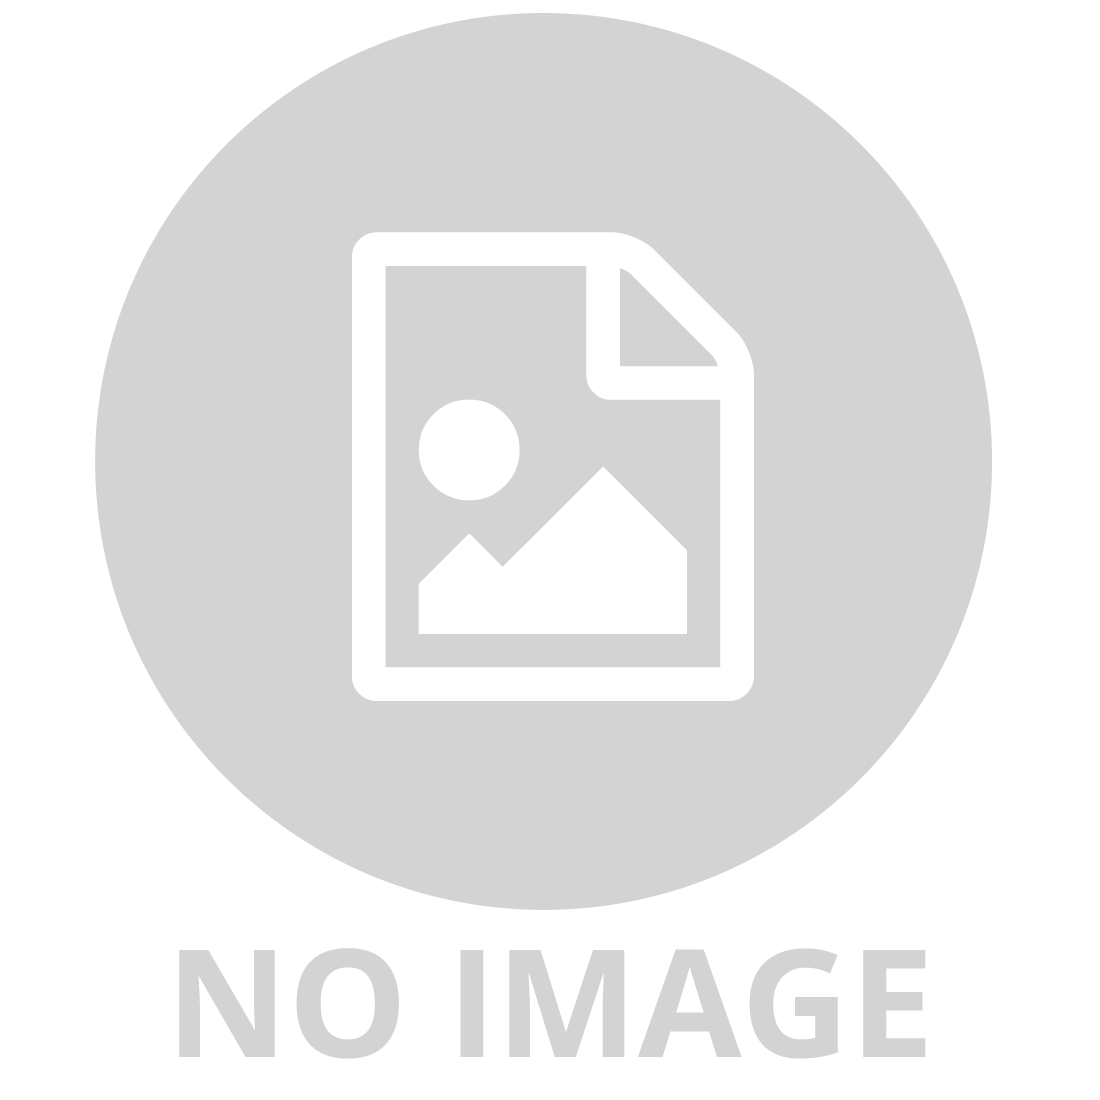 TONKA STEEL CLASSICS TOUGH BULLDOZER